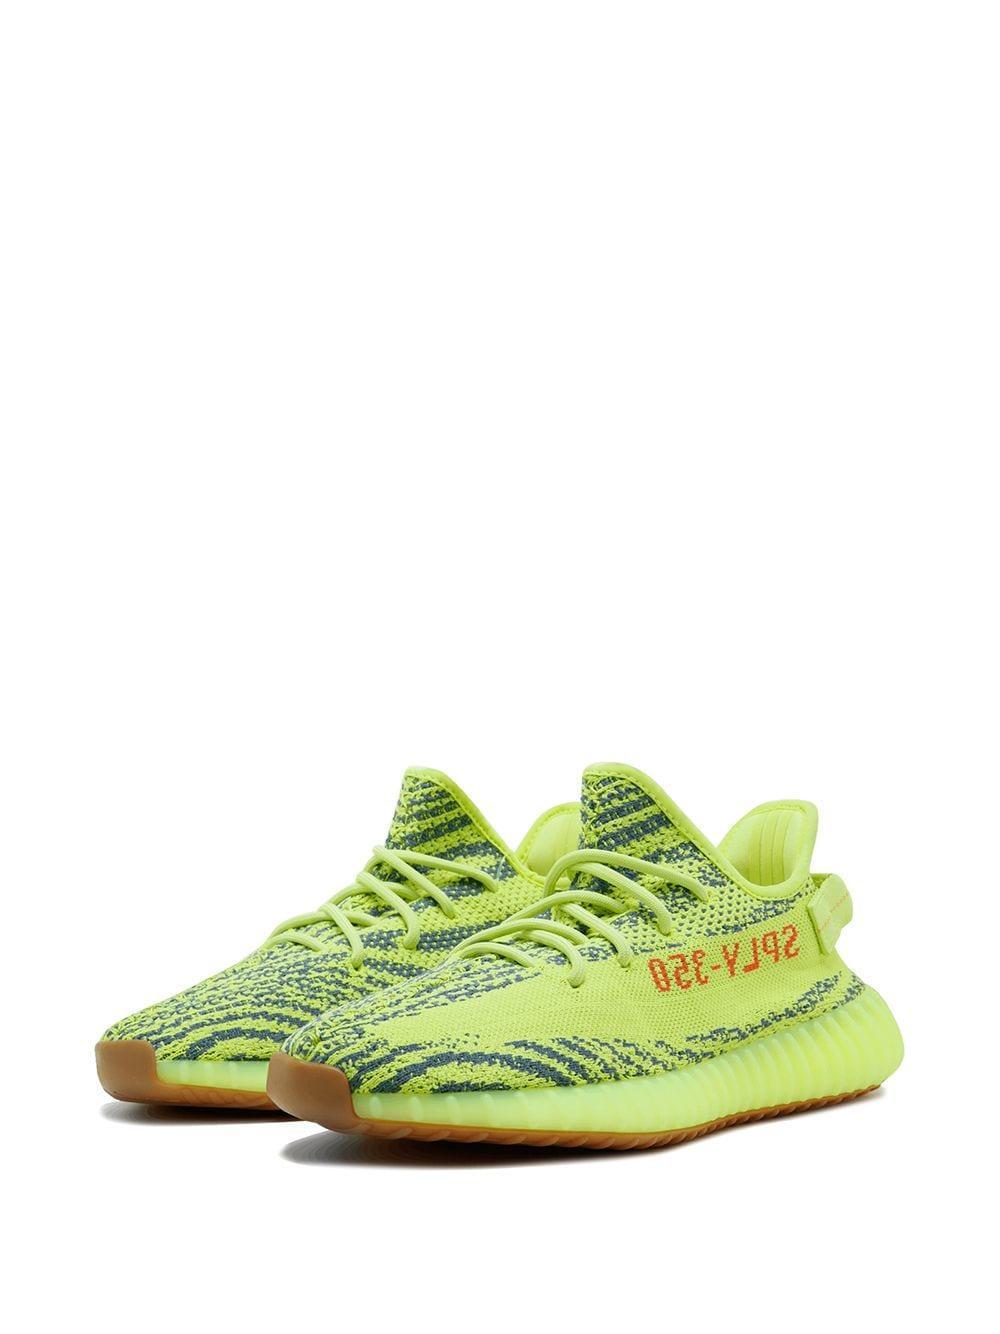 Yeezy Yeezy Boost 350 V2 \